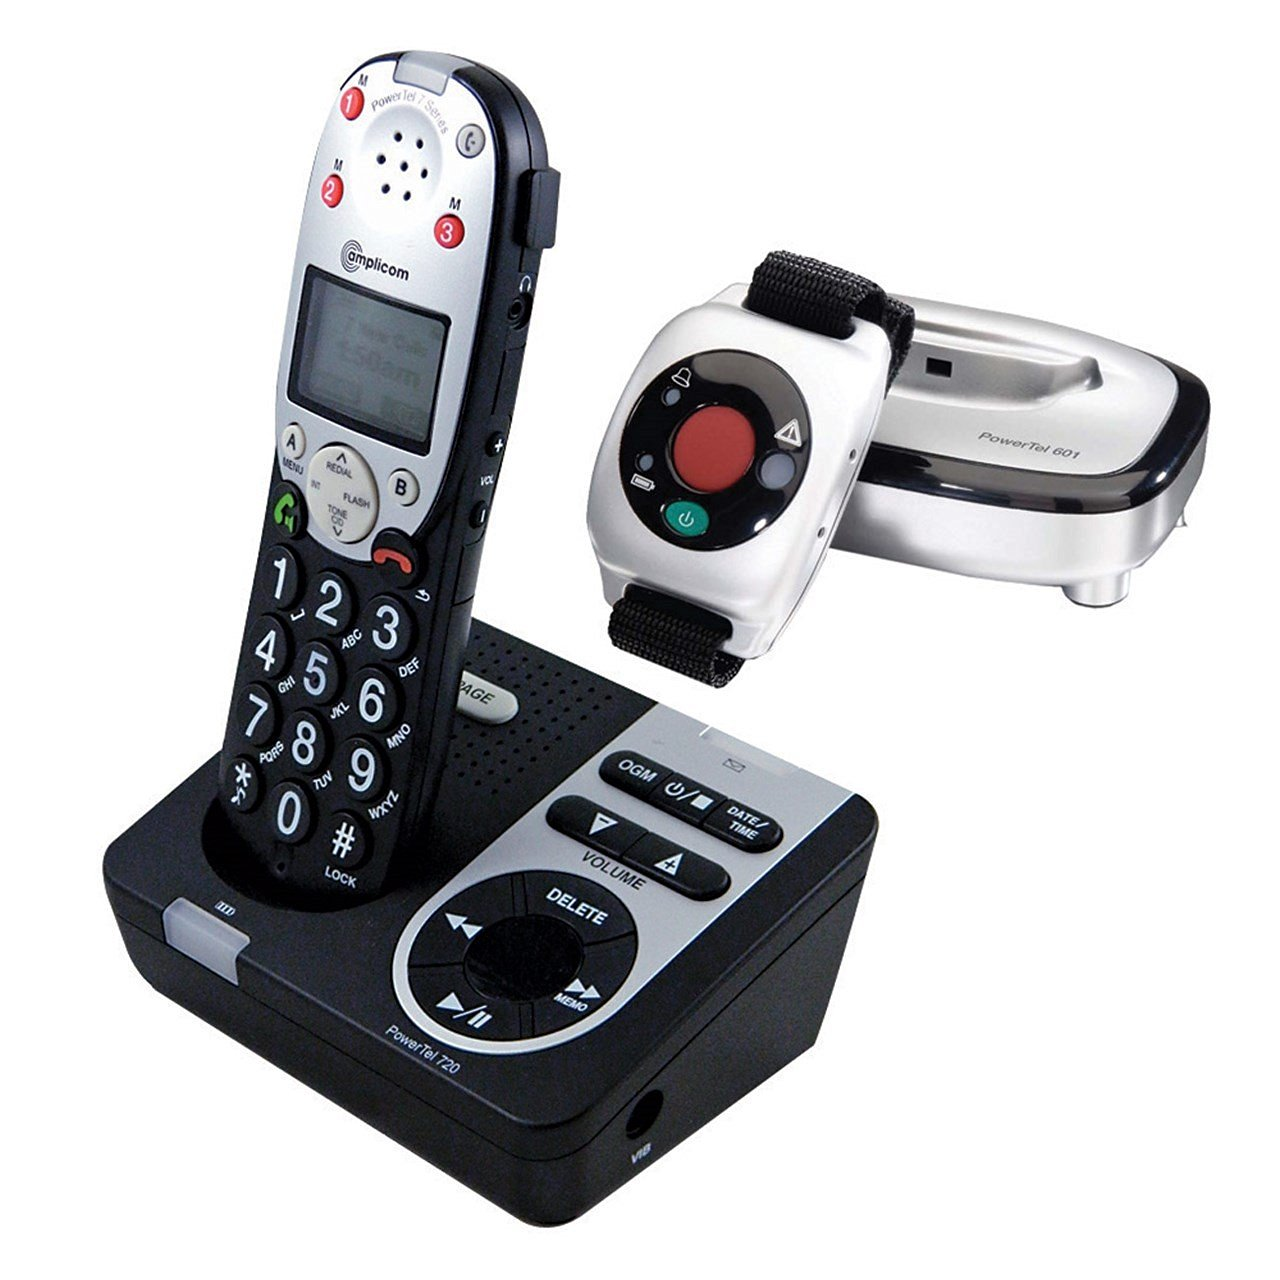 Amplicom 95745 PowerTel 725 Reliant Plus Amplified Phone